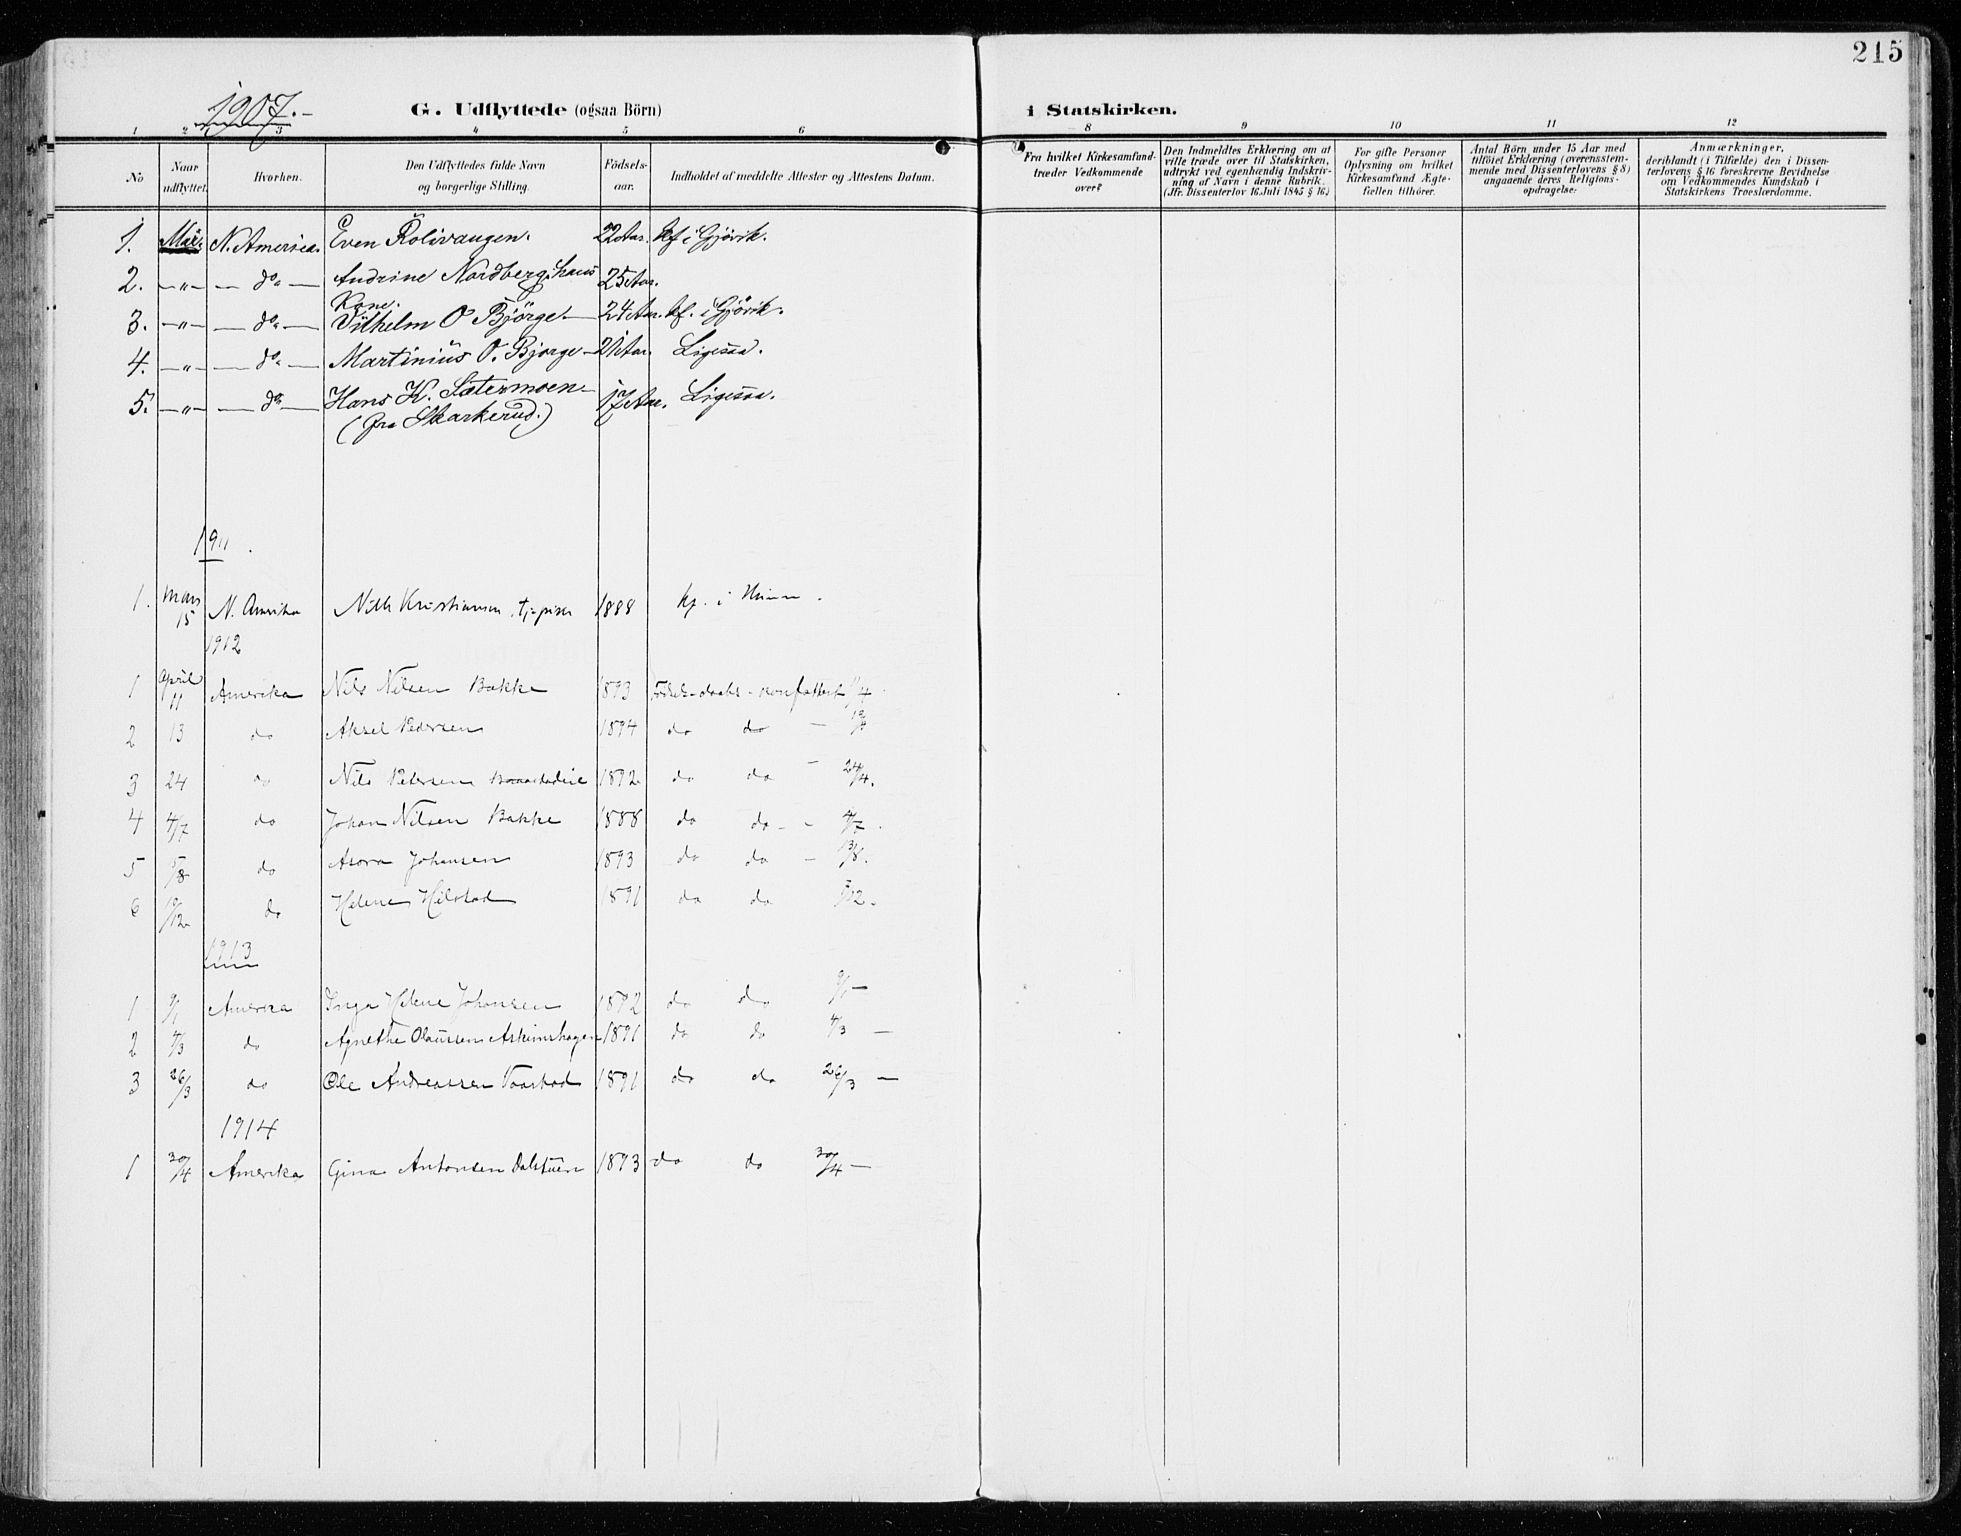 SAH, Vardal prestekontor, H/Ha/Haa/L0016: Ministerialbok nr. 16, 1904-1916, s. 215